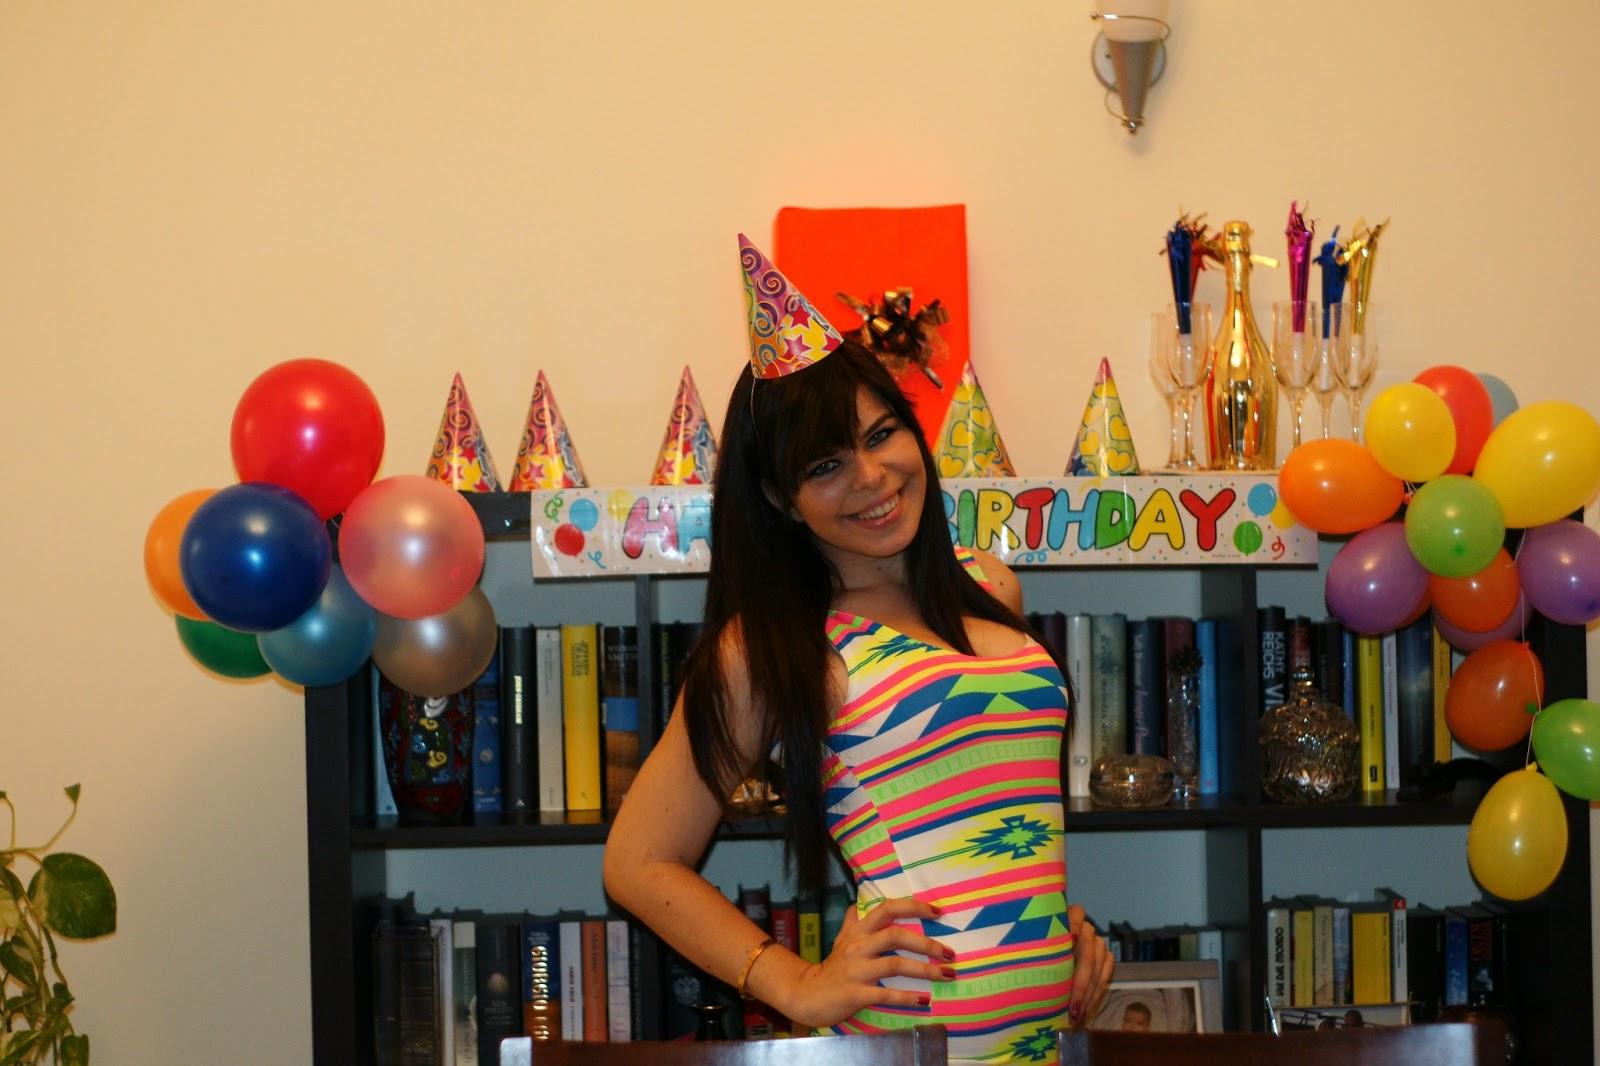 I'm Finally 21!